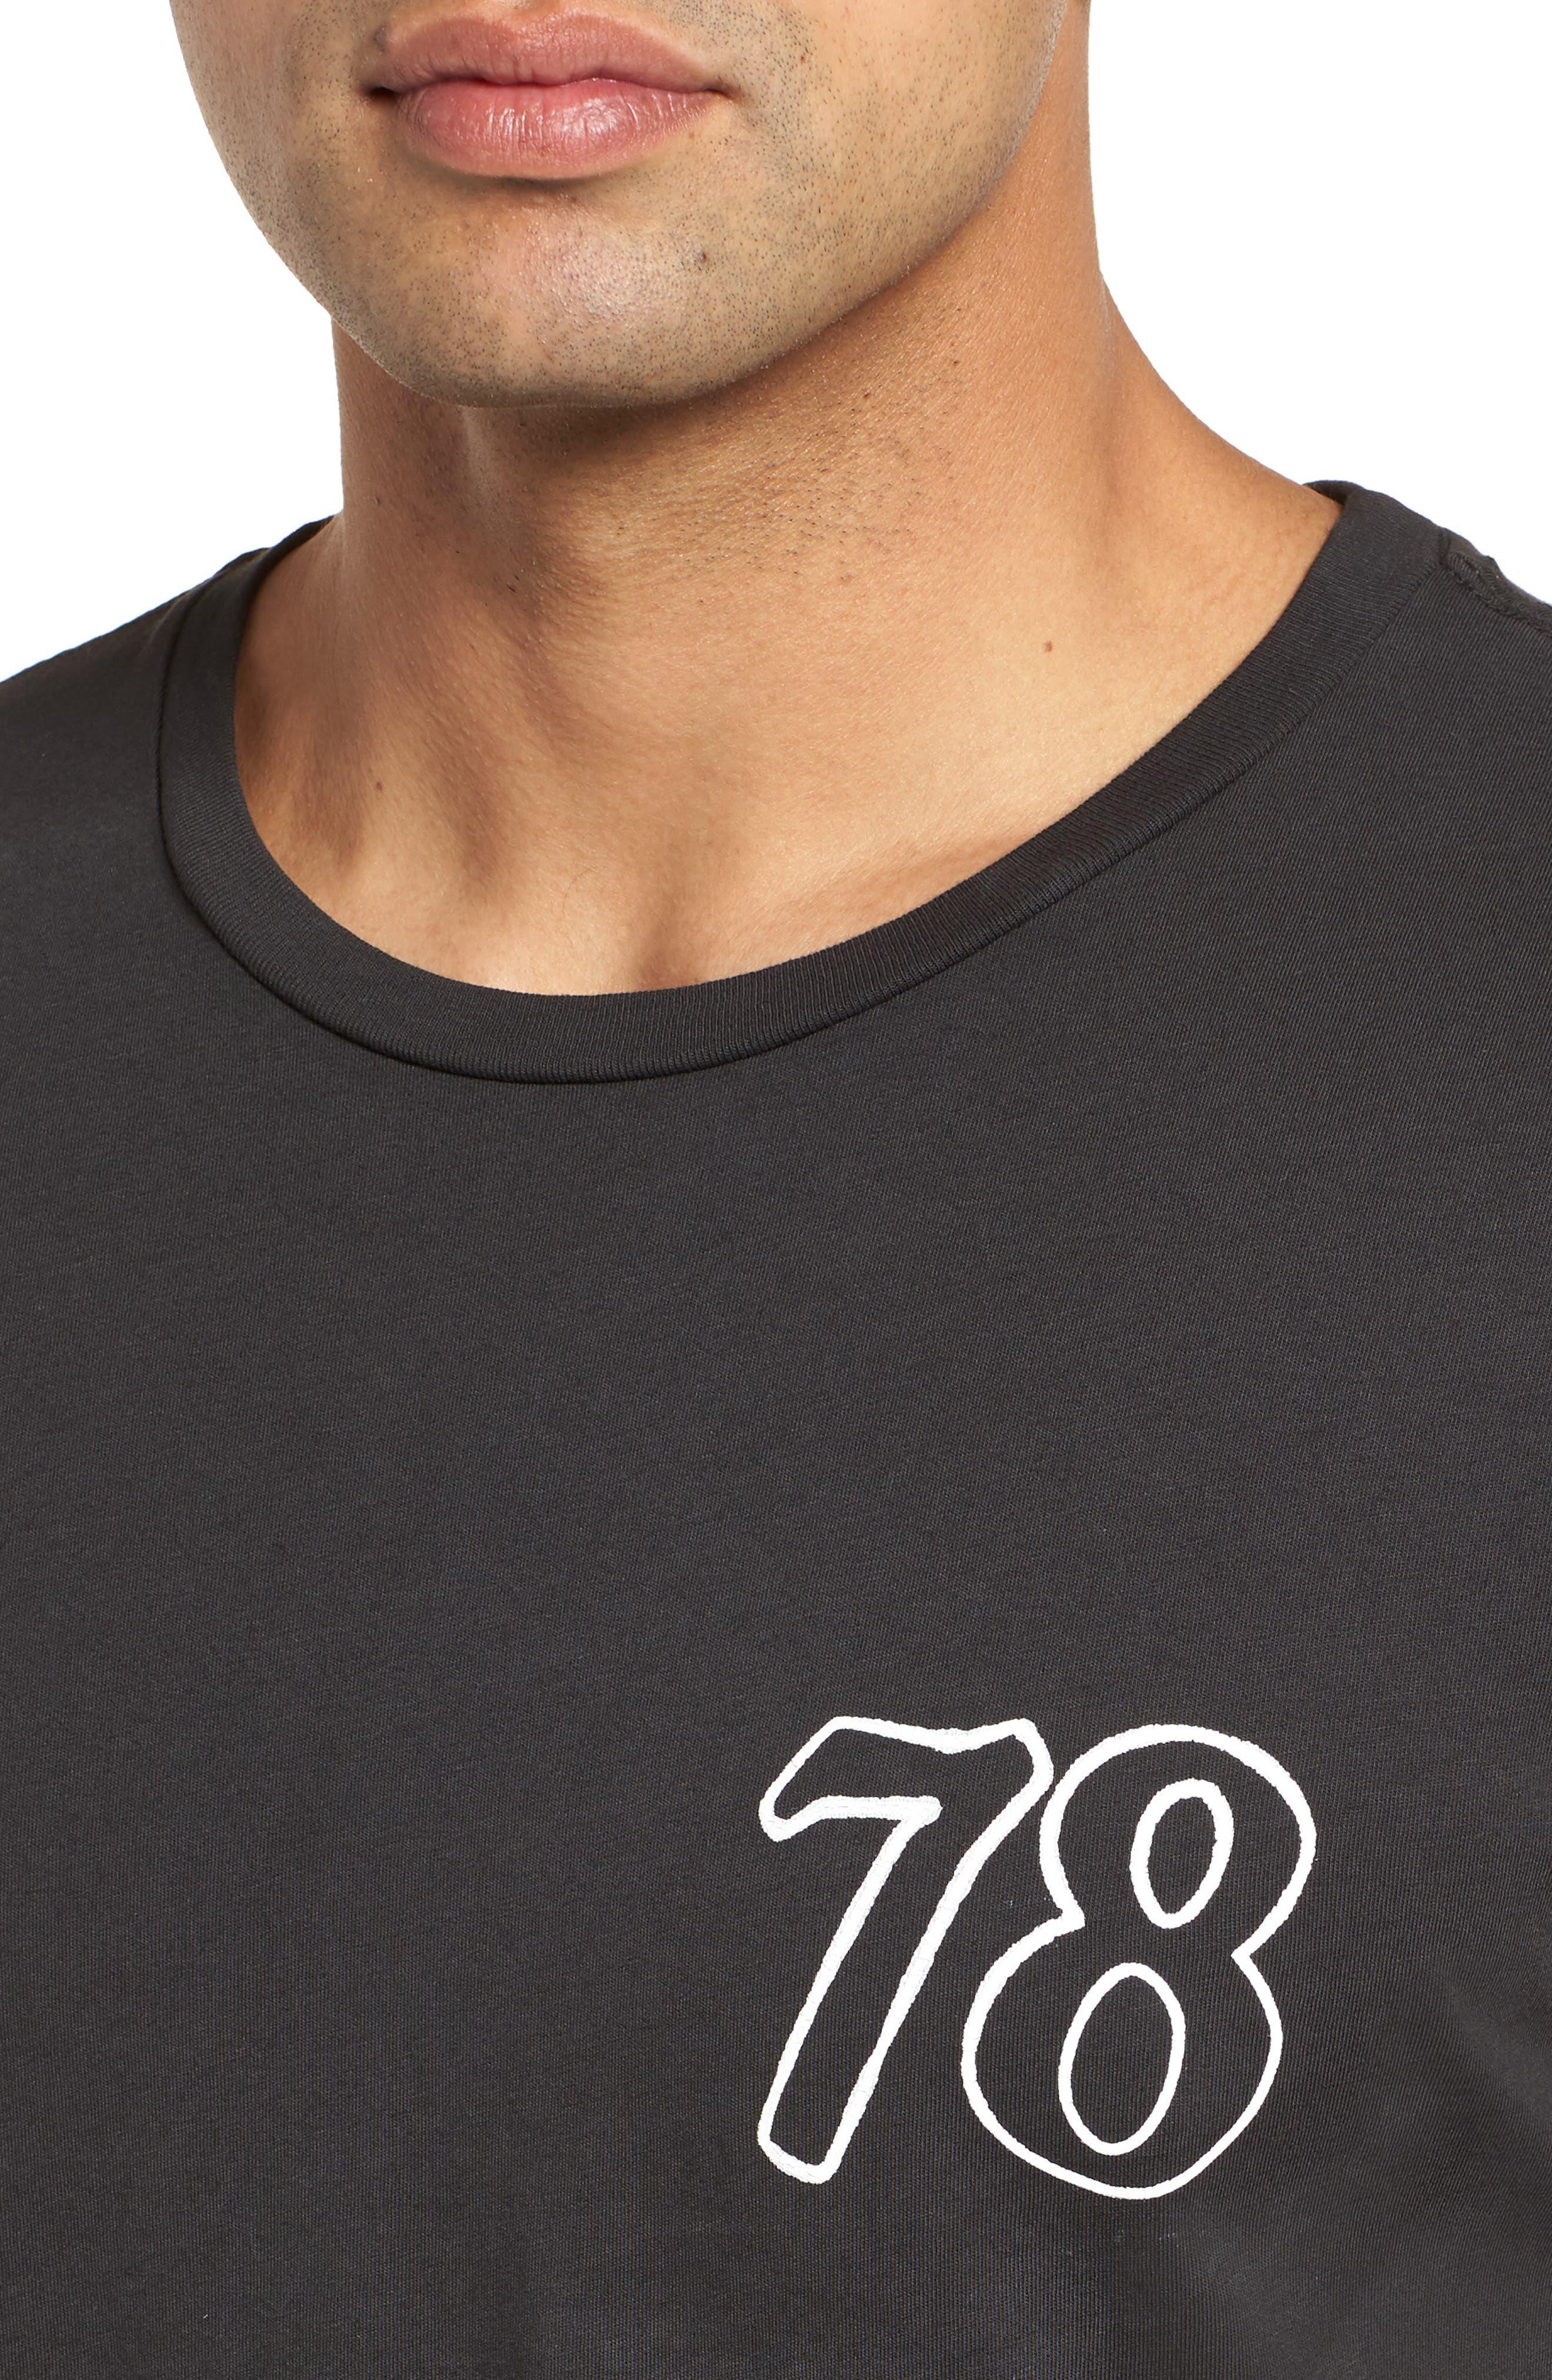 Only the Good Crewneck T-Shirt,                             Alternate thumbnail 4, color,                             Dusty Black